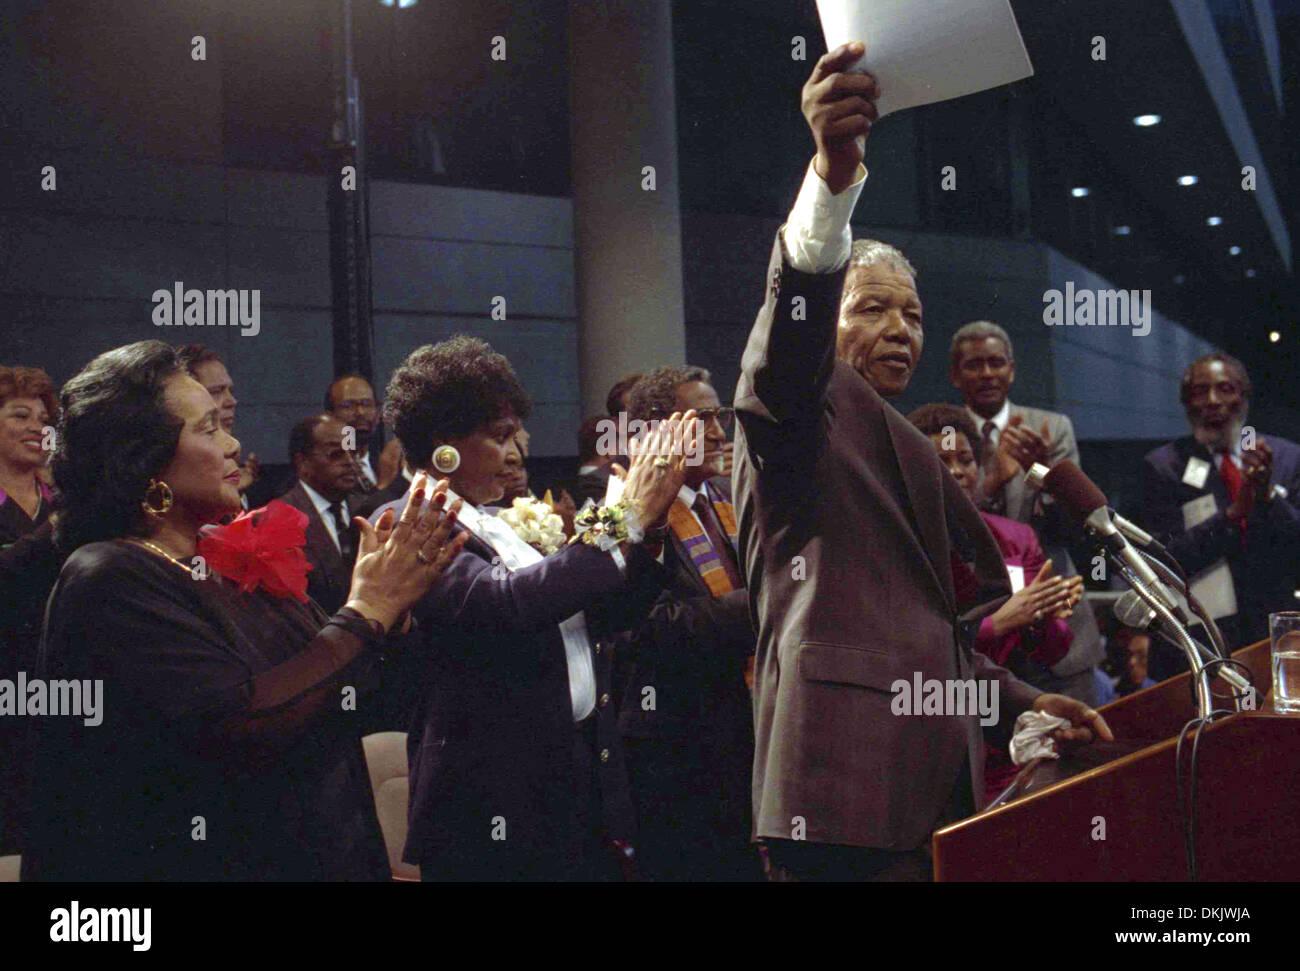 Nelson Mandela addresses crowd at Georgia Tech Stadium in Atlanta. - Stock Image